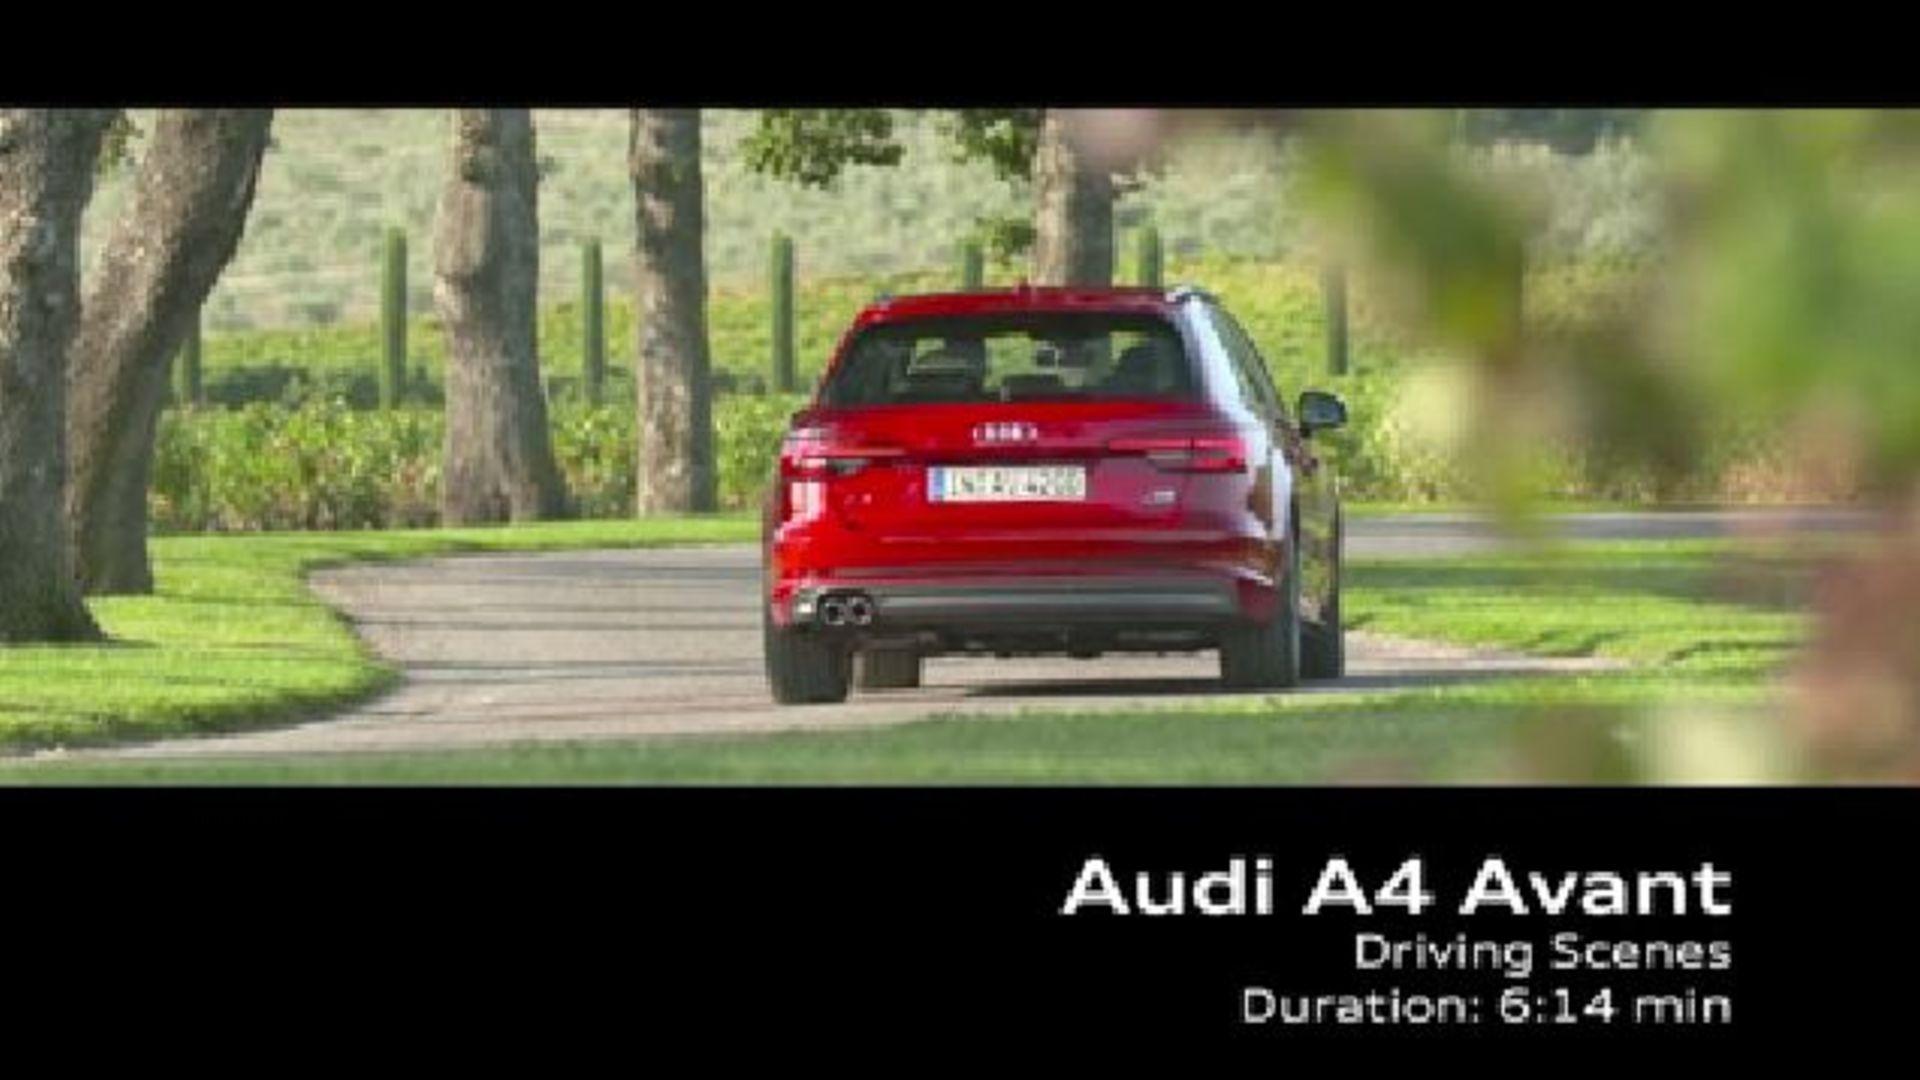 Audi A4 Avant (2015) - Footage France